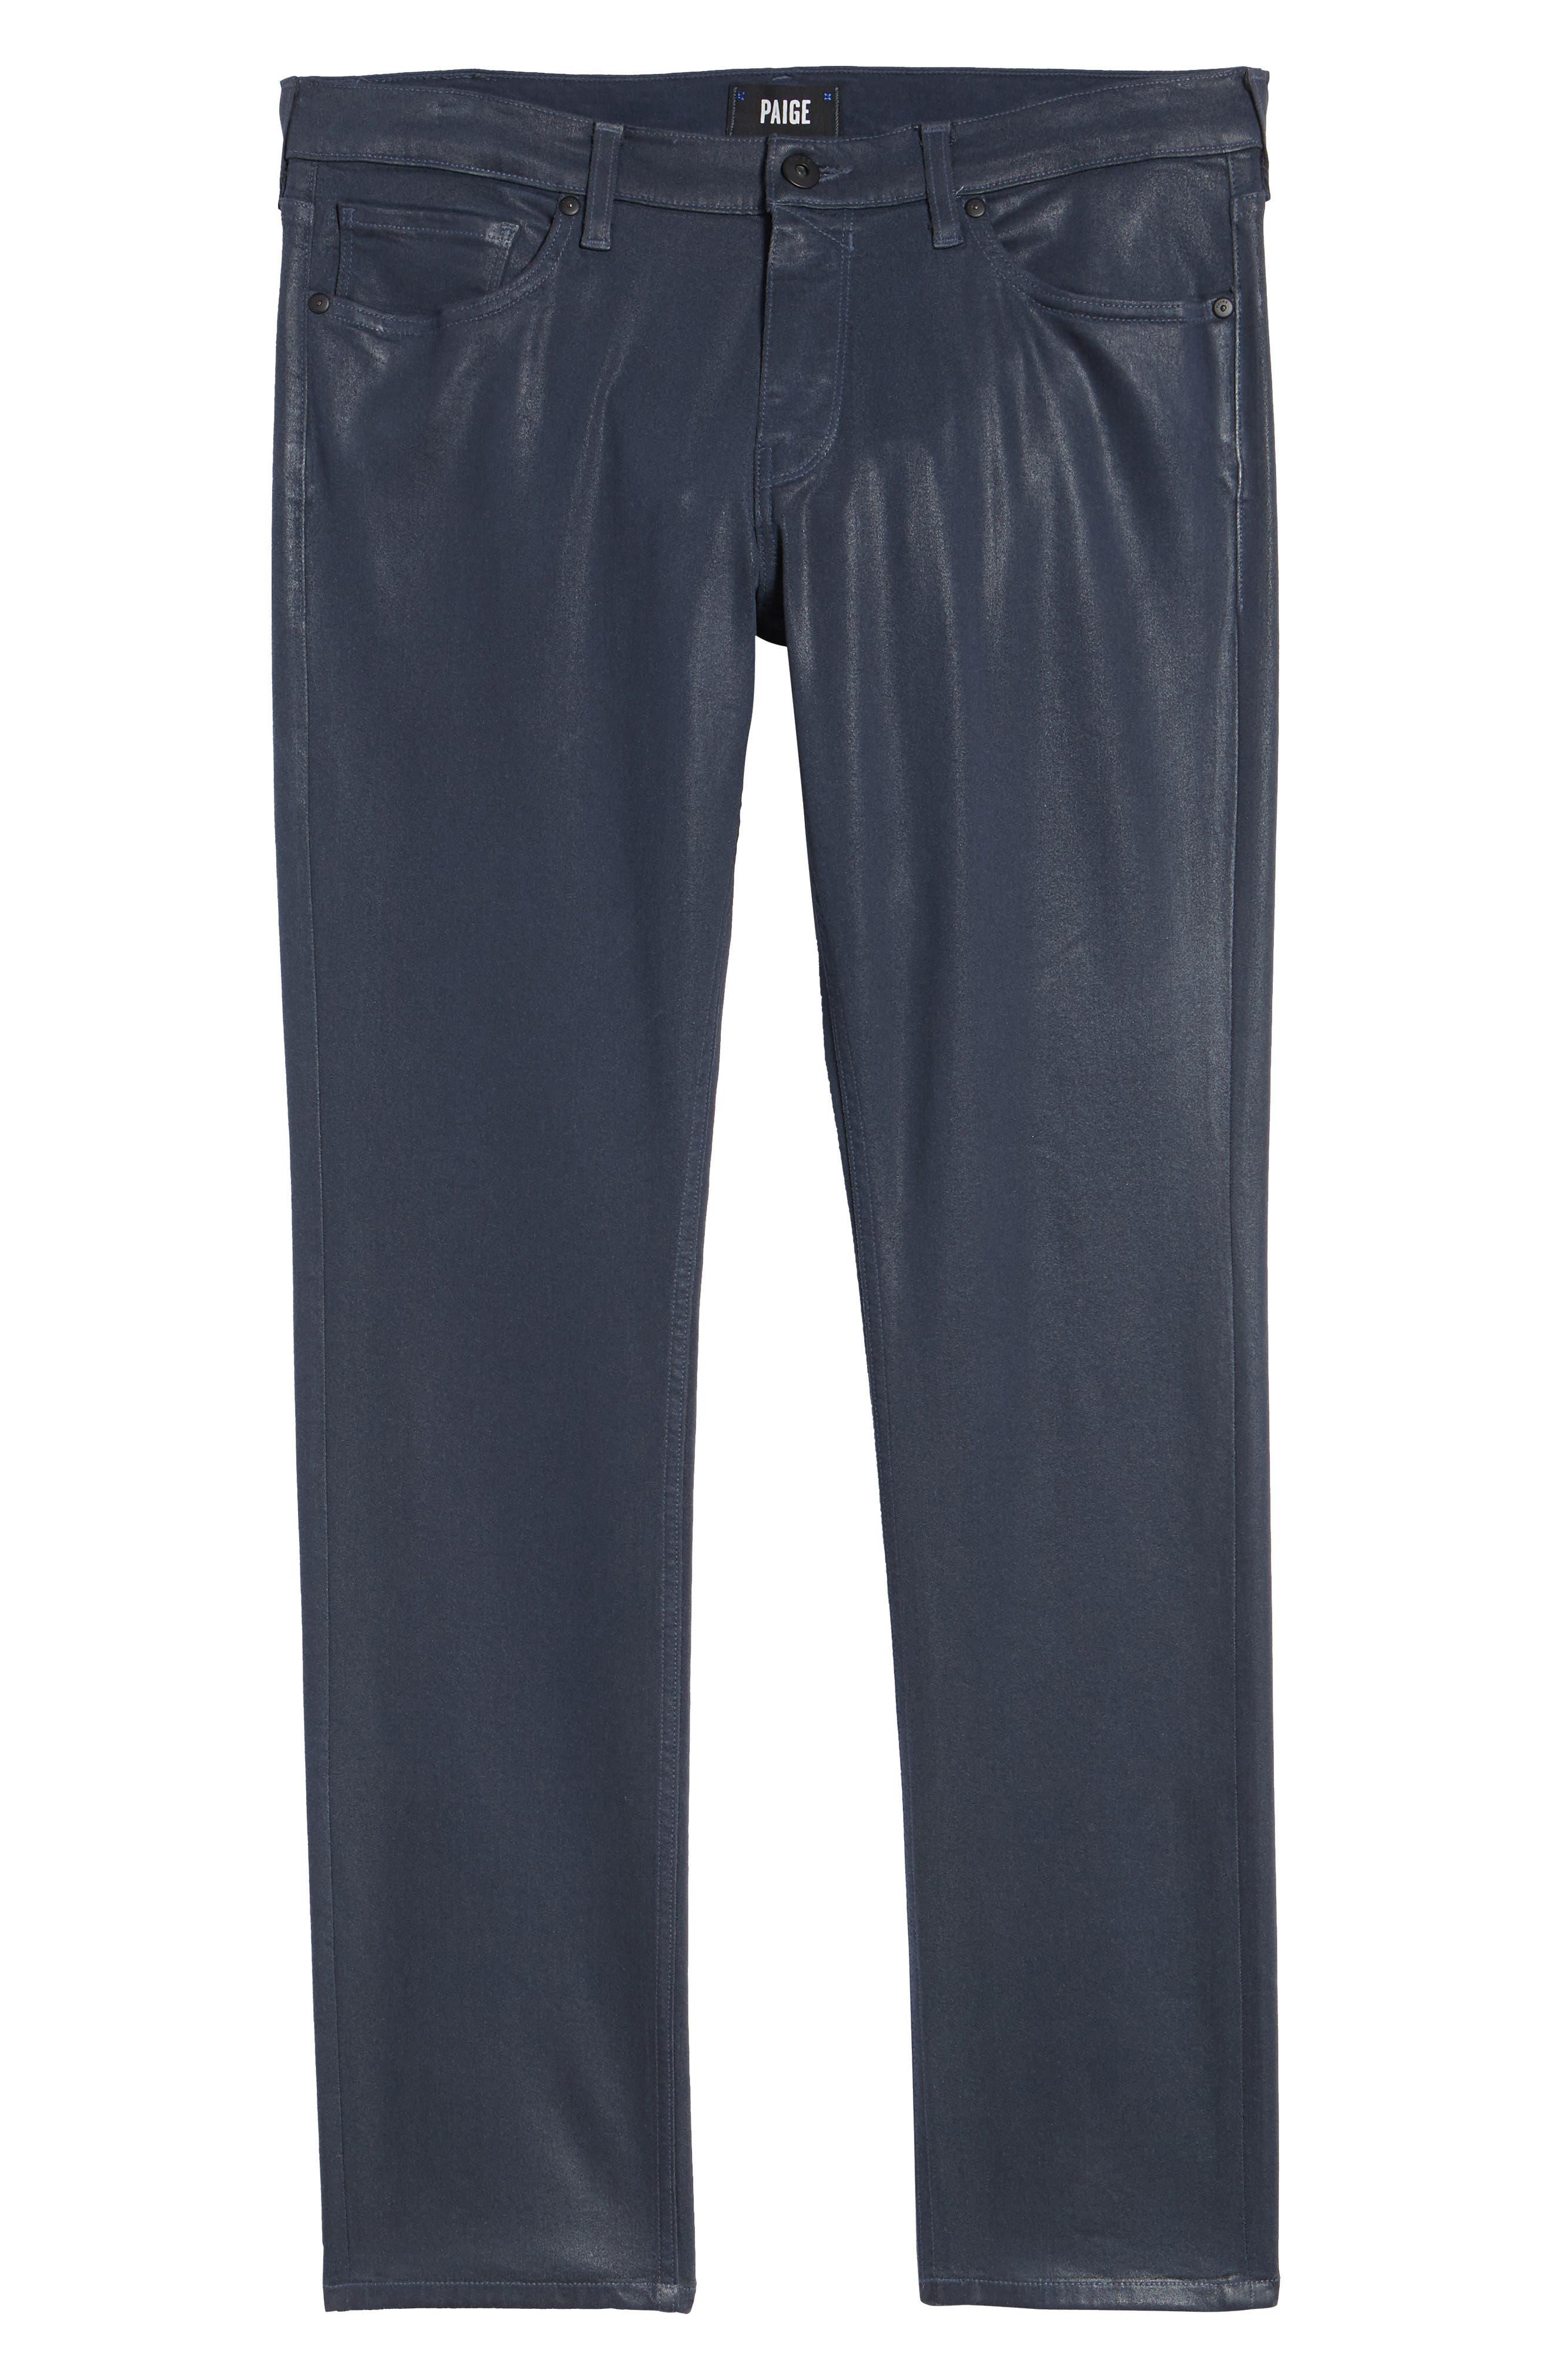 Transcend - Lennox Slim Fit Jeans,                             Alternate thumbnail 6, color,                             NIGHTFALL COATED